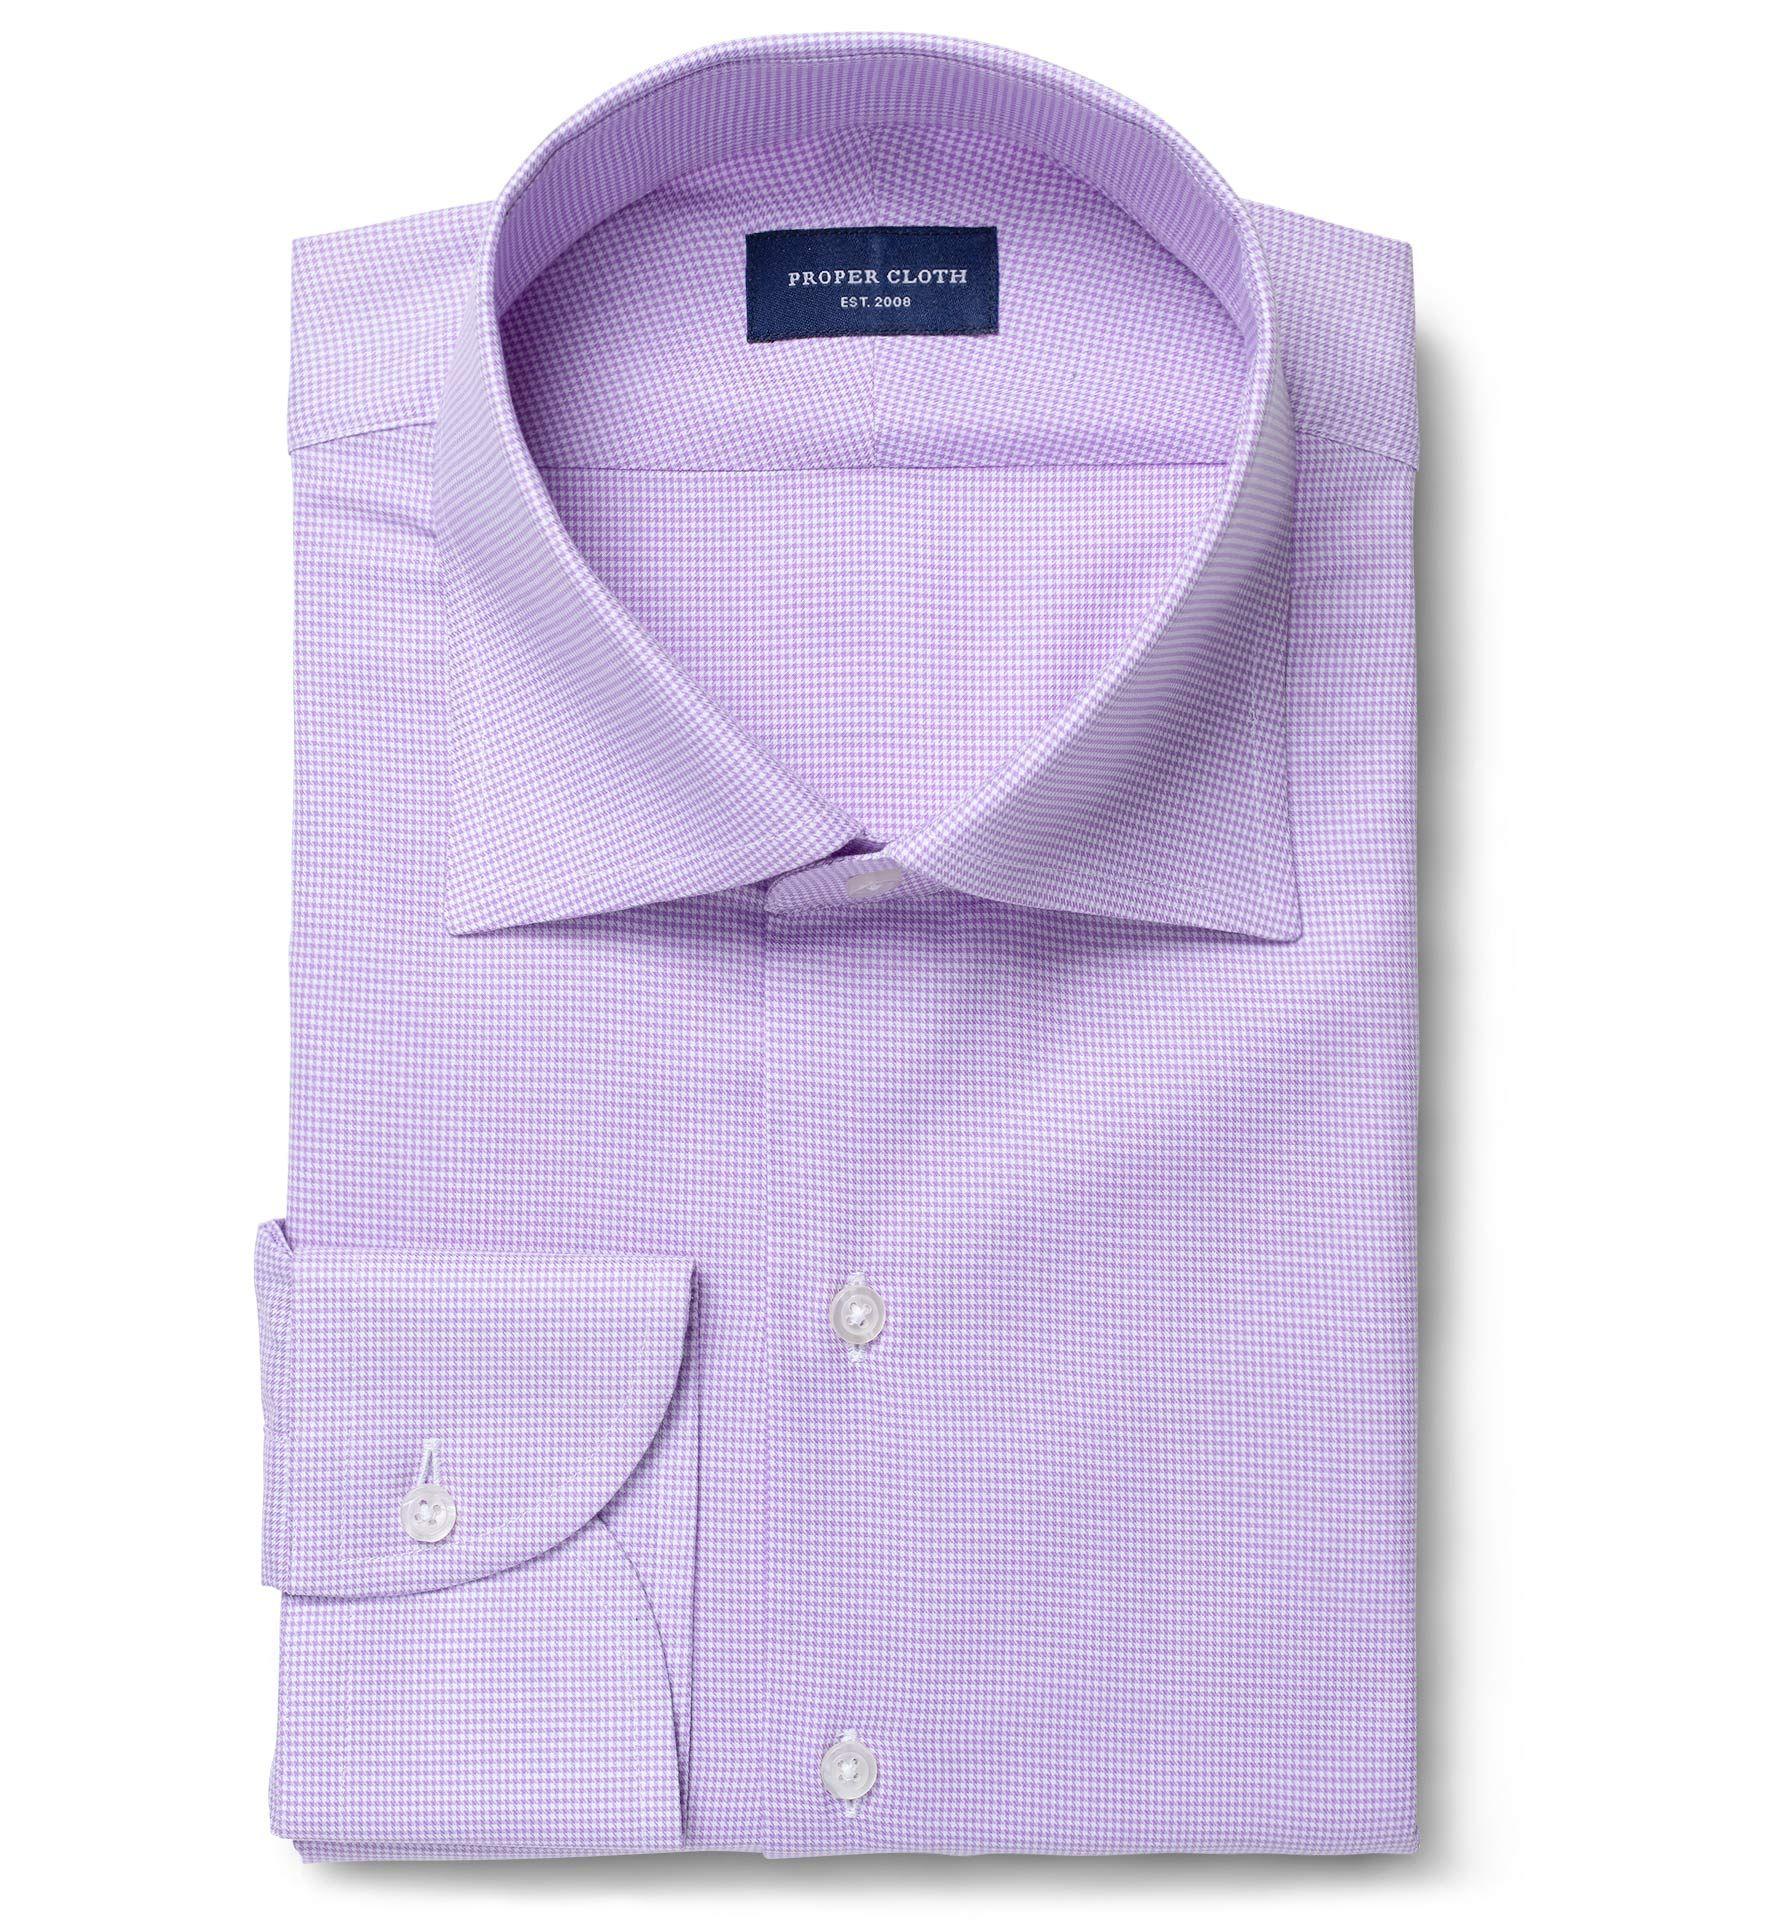 Morris Lavender Wrinkle Resistant Houndstooth Fitted Dress